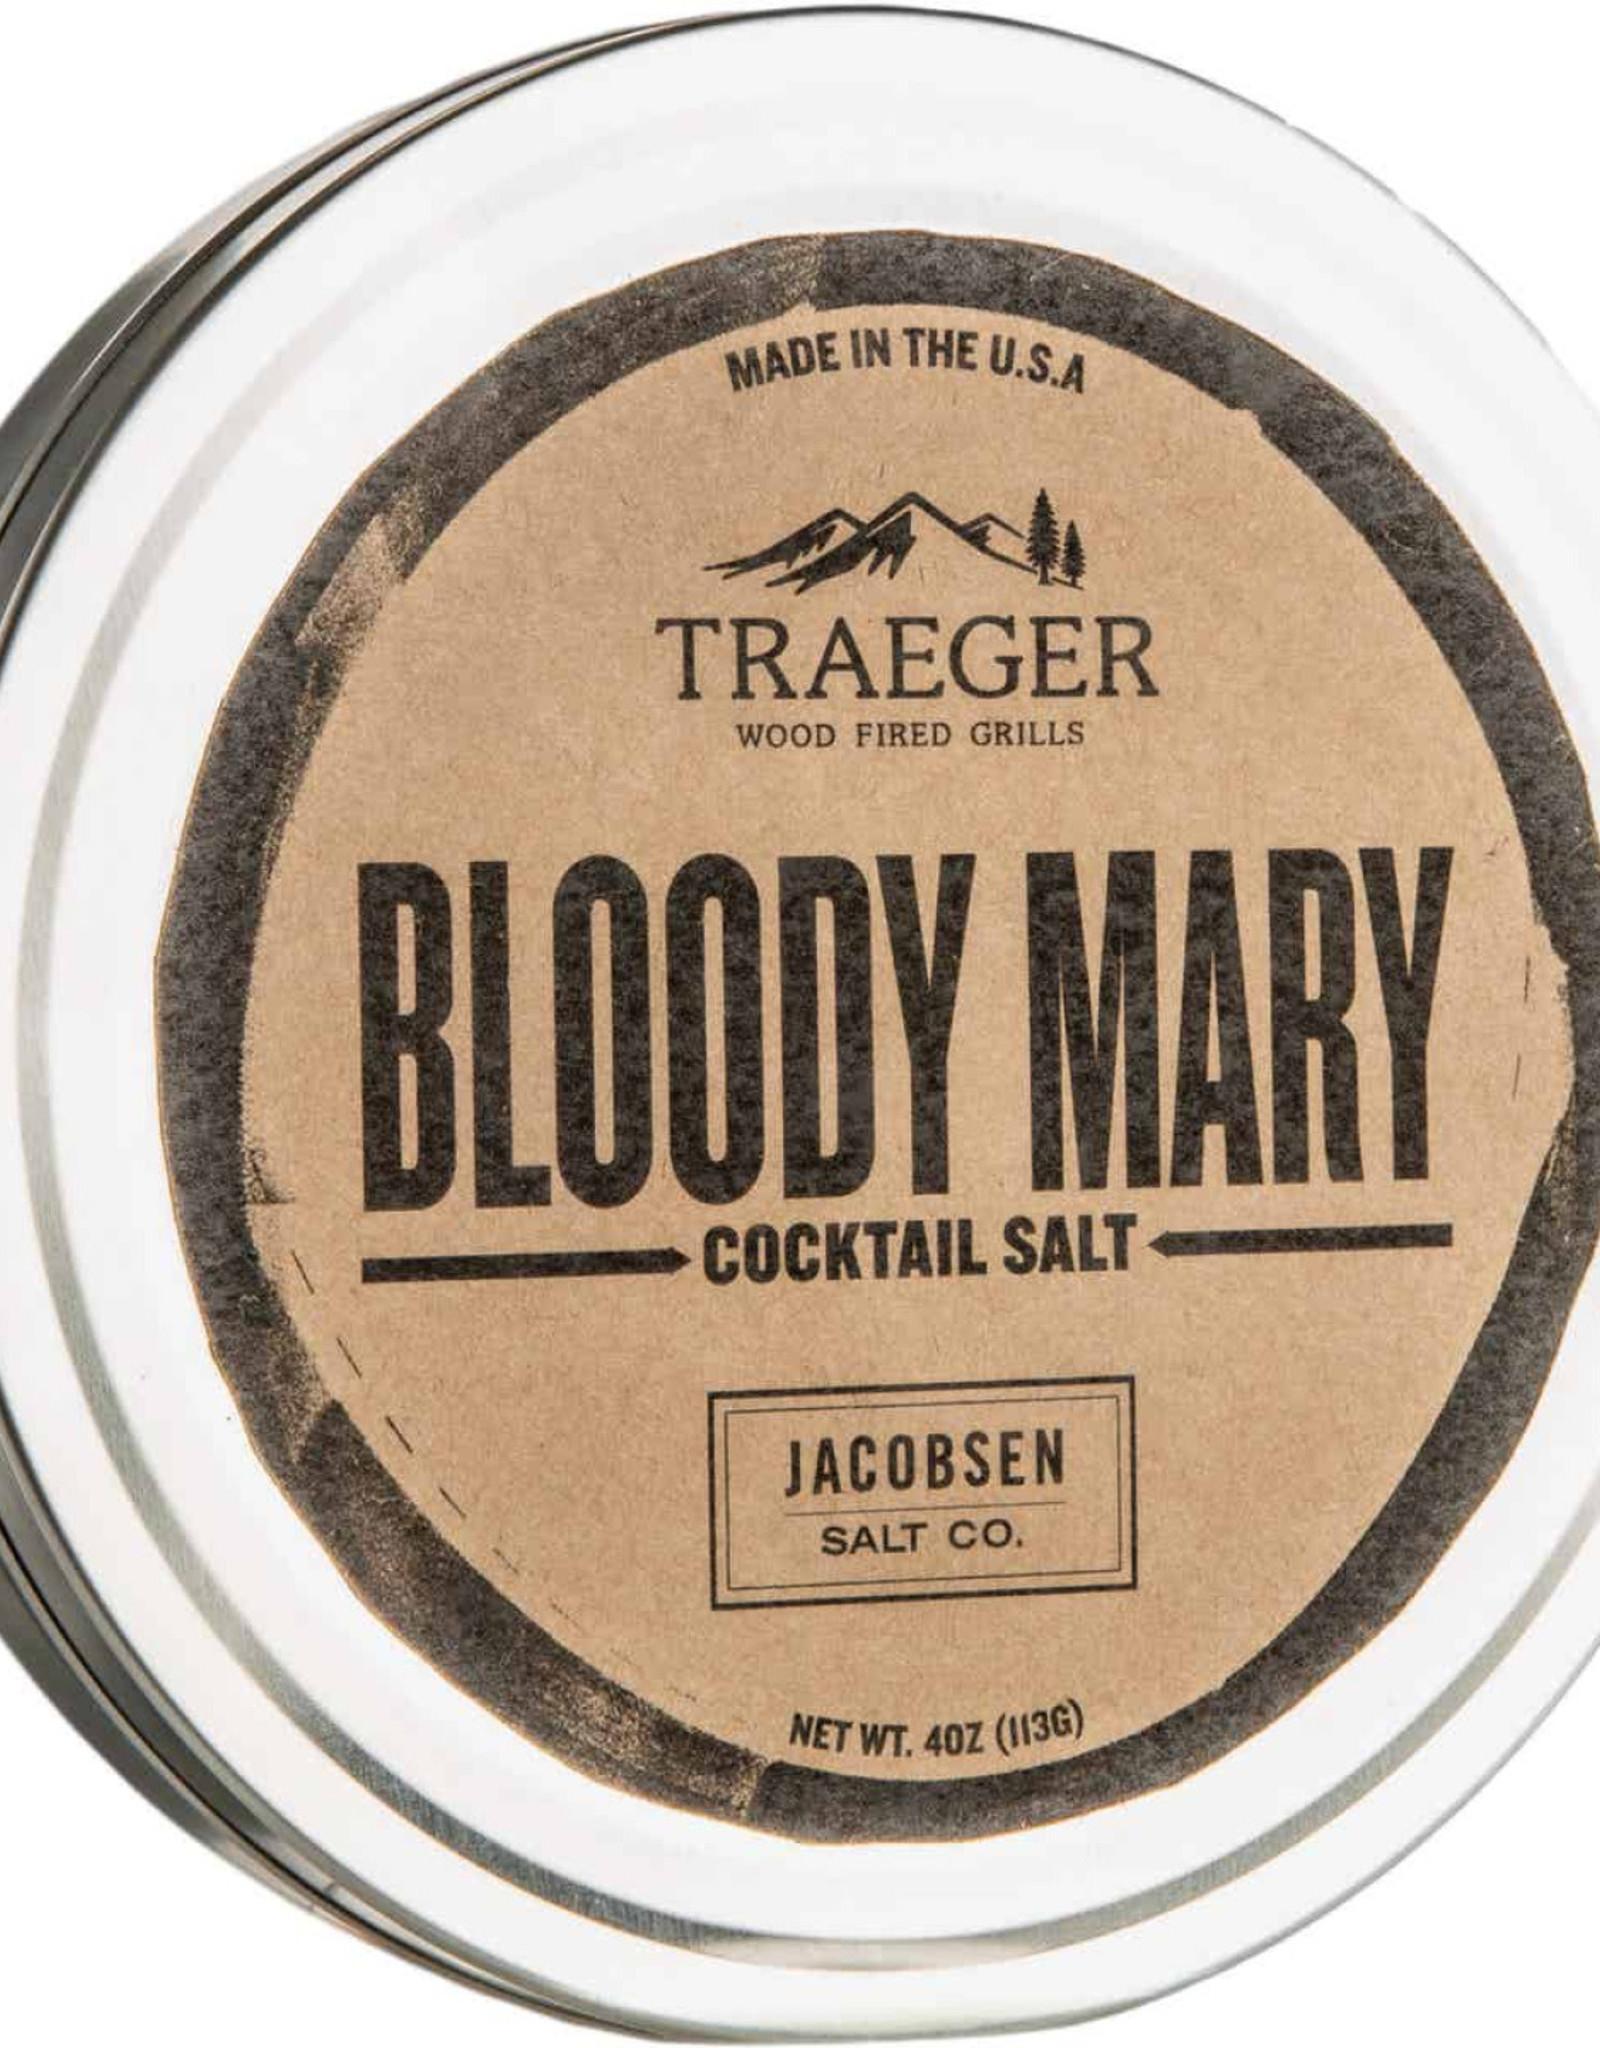 Traeger Traeger Bloody Mary Cocktail Salt (4 oz.) - SPC175